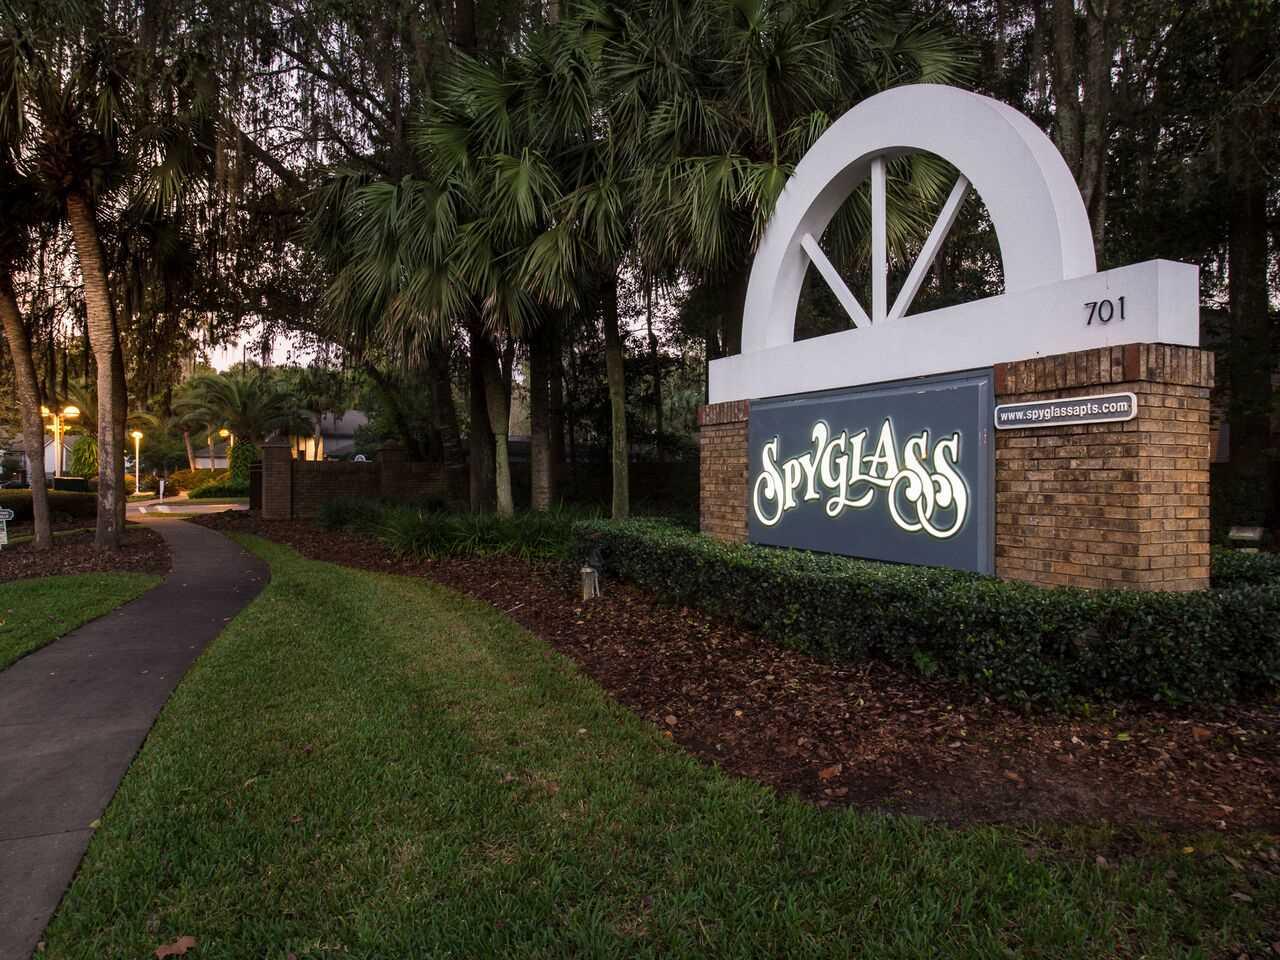 Spyglass road sign